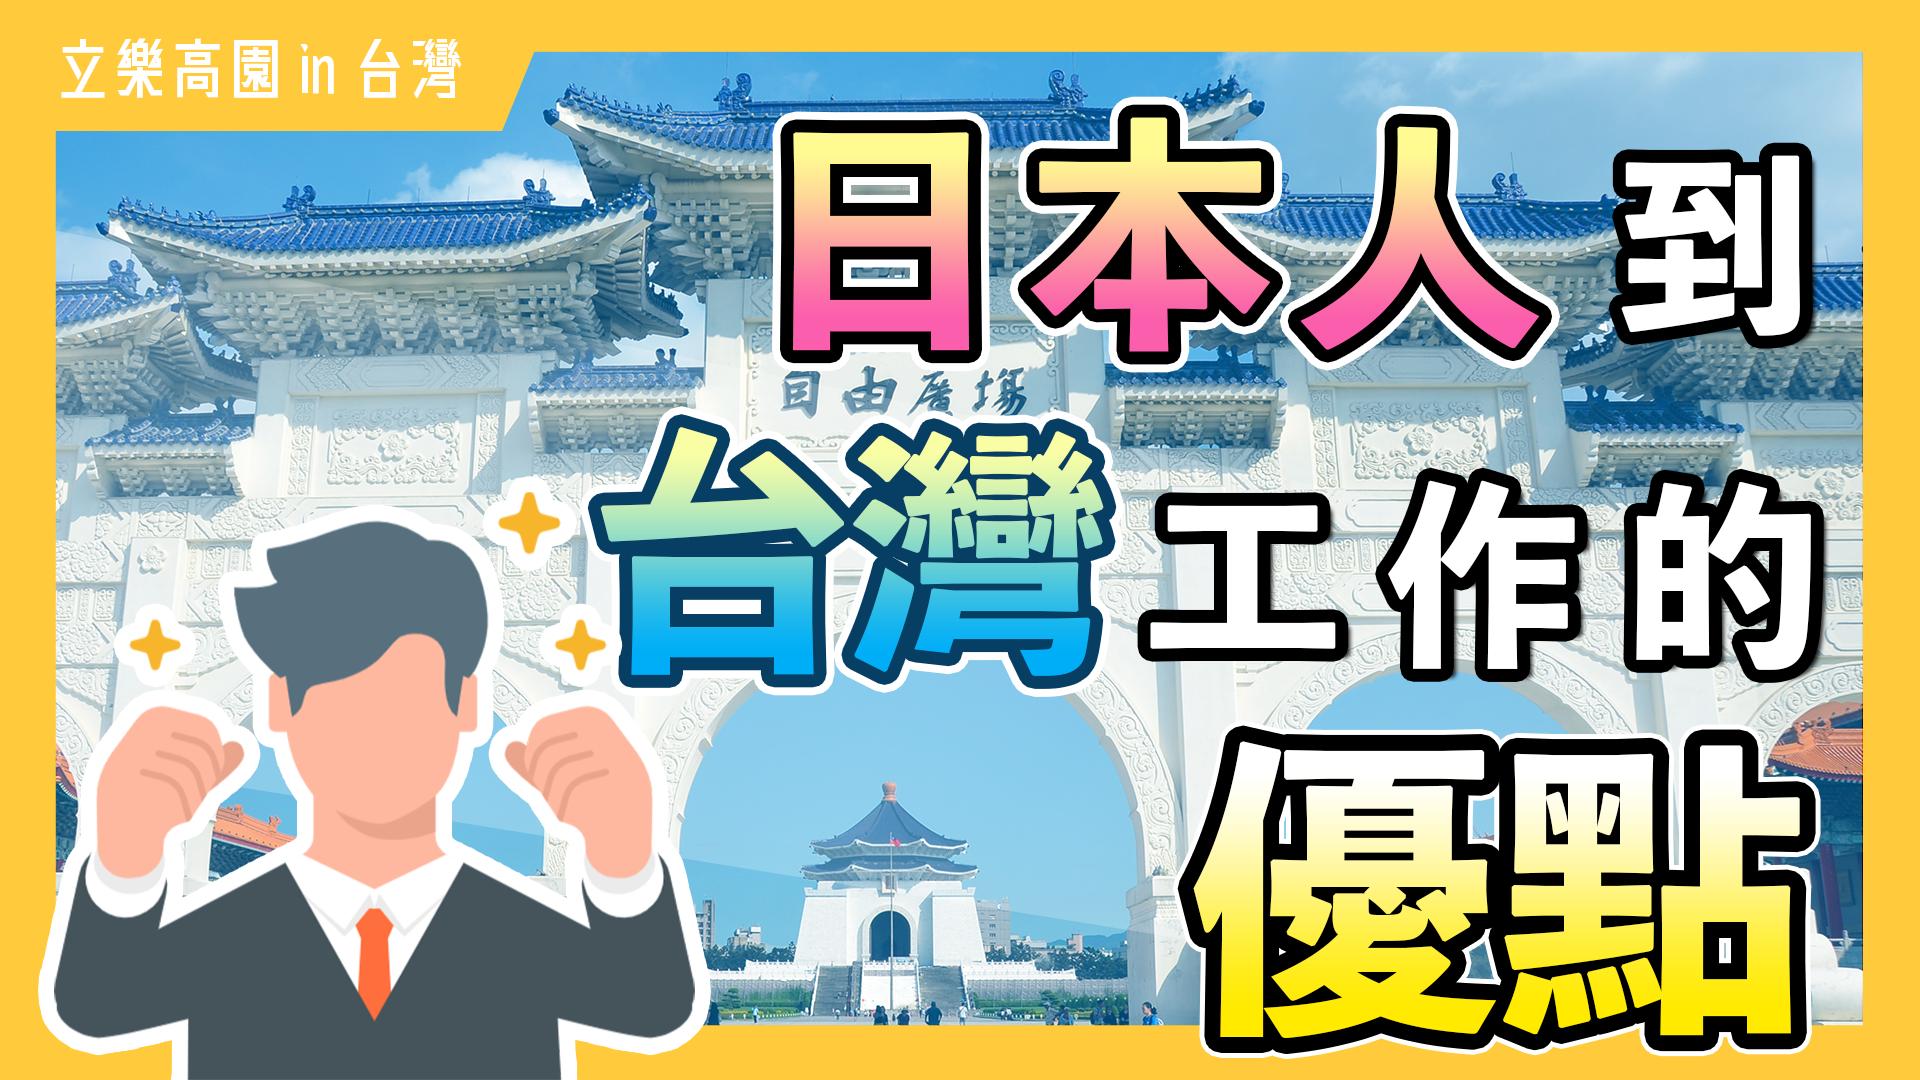 【DAILY】日本人在台灣「工作的優點」台灣生活工作相關解說#3| 立樂高園 IN 台灣